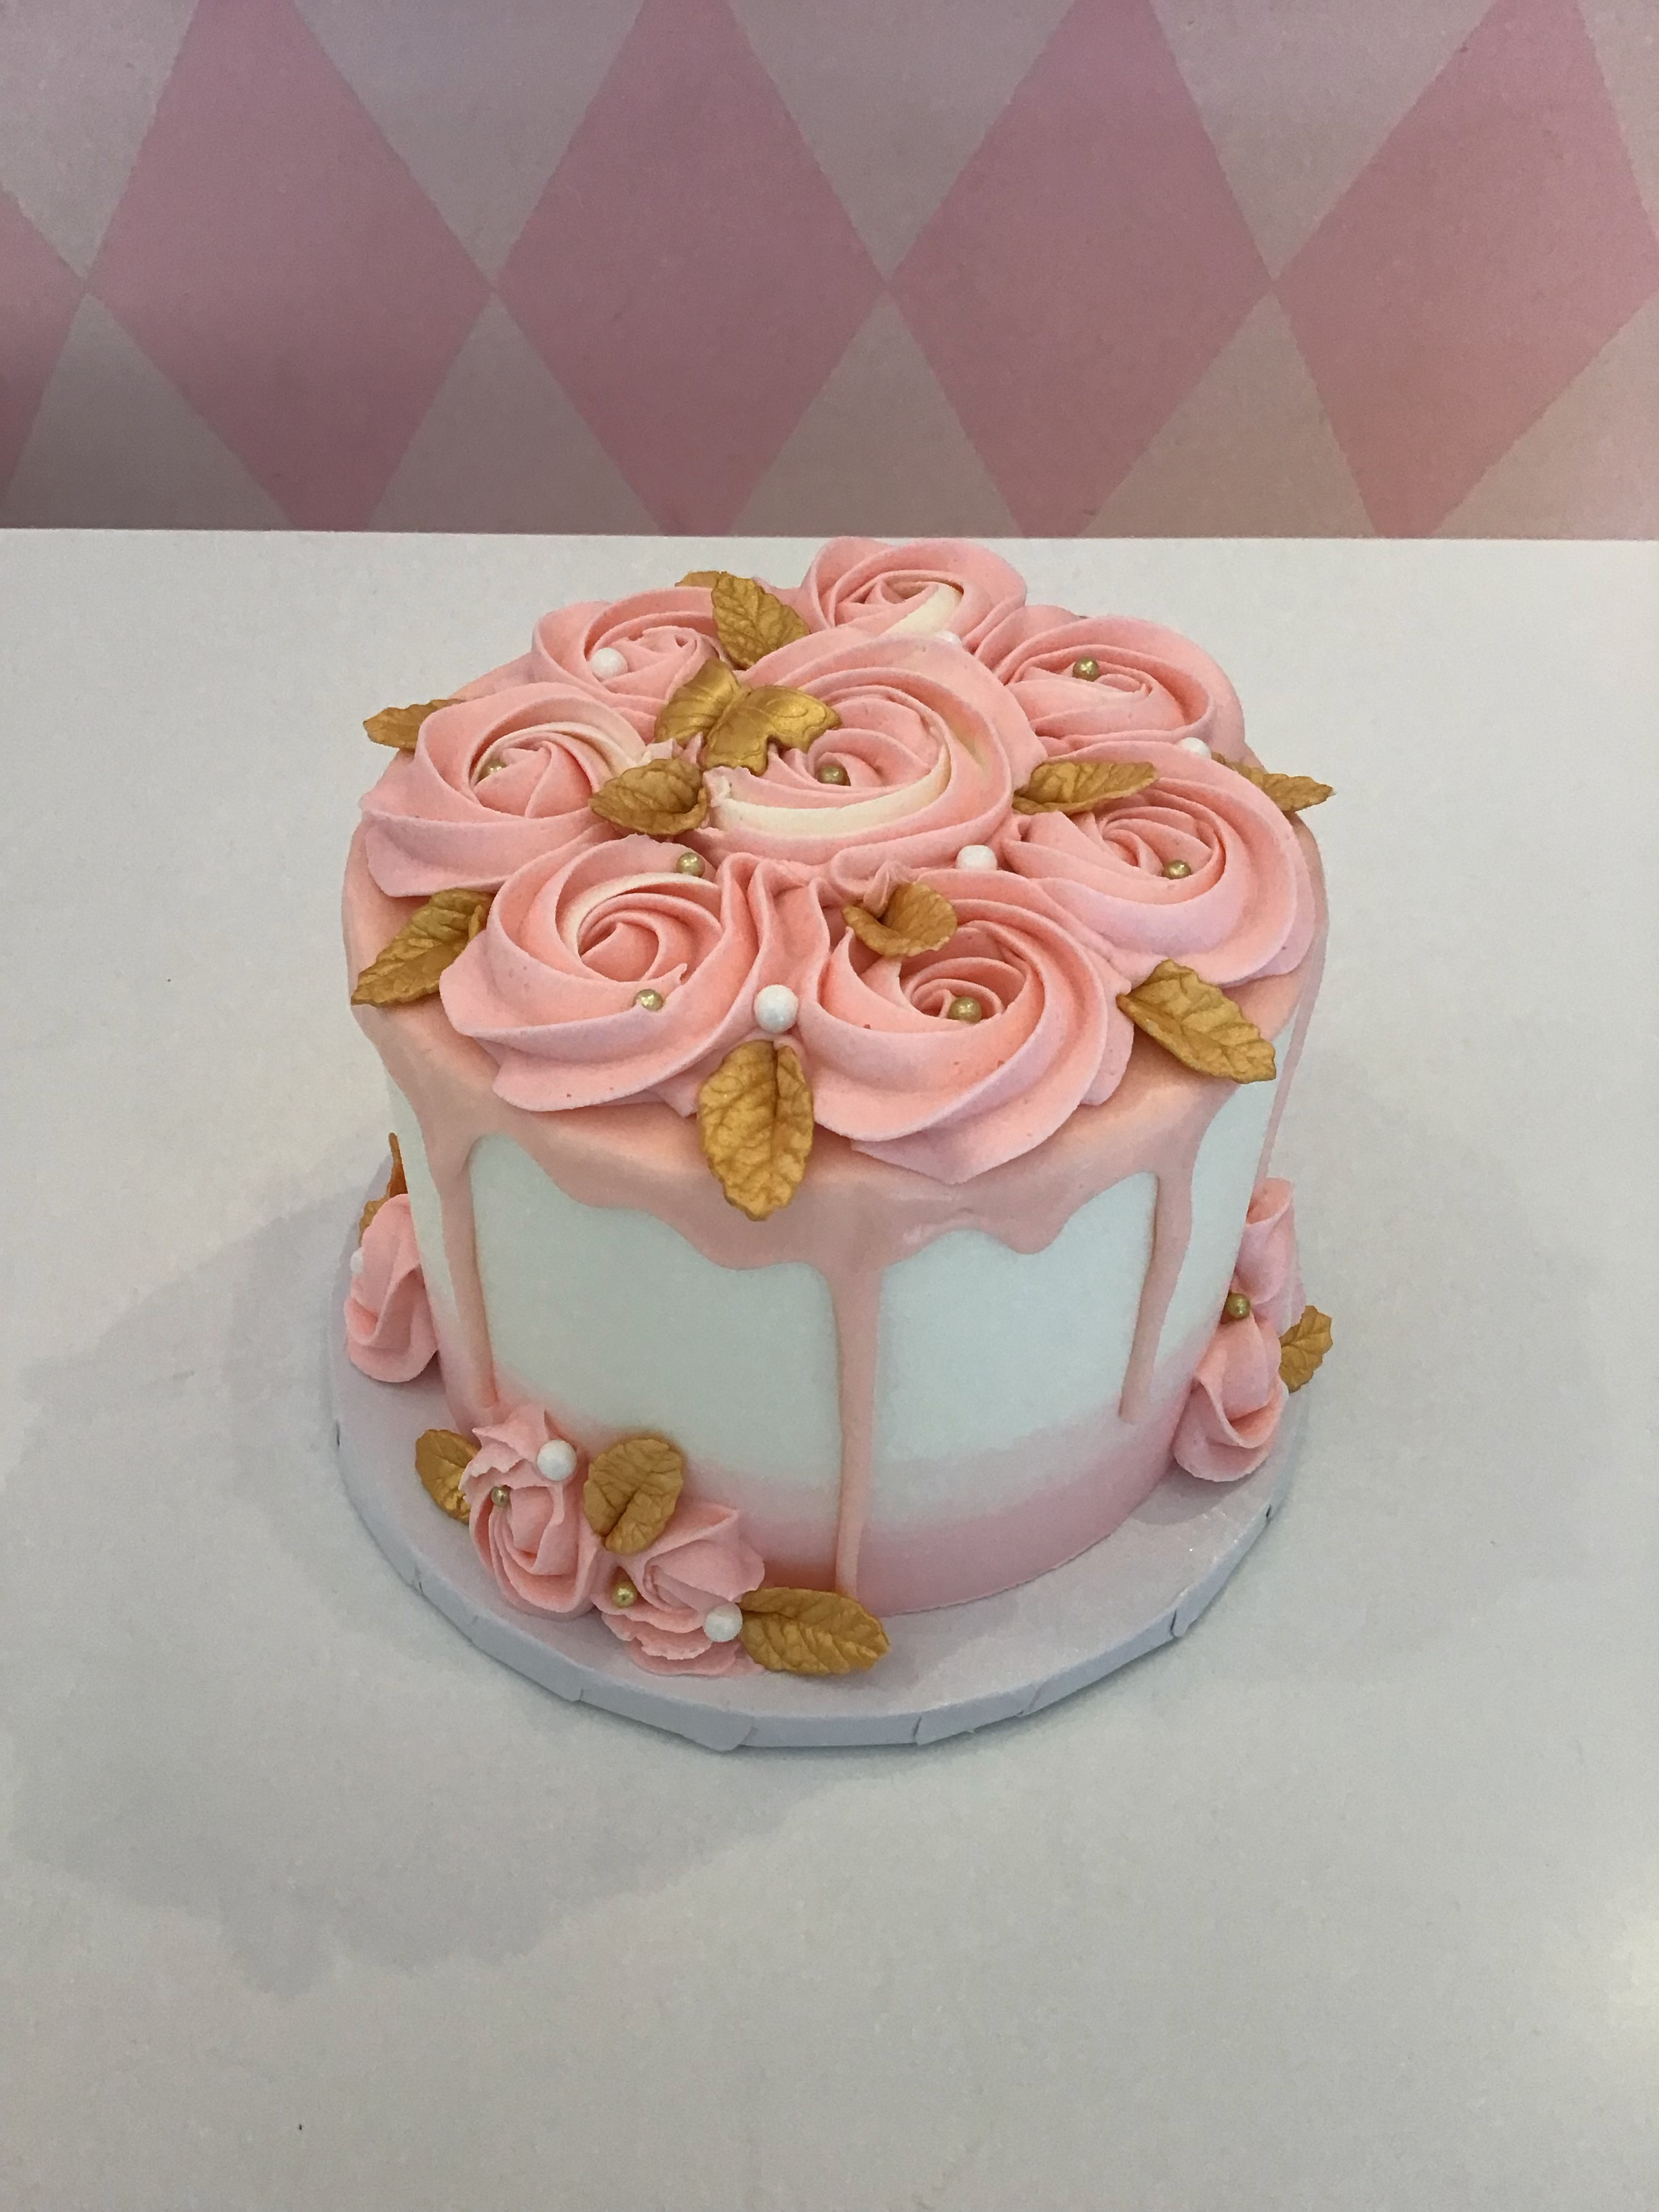 SweetPea Cake & Cupcake Boutique